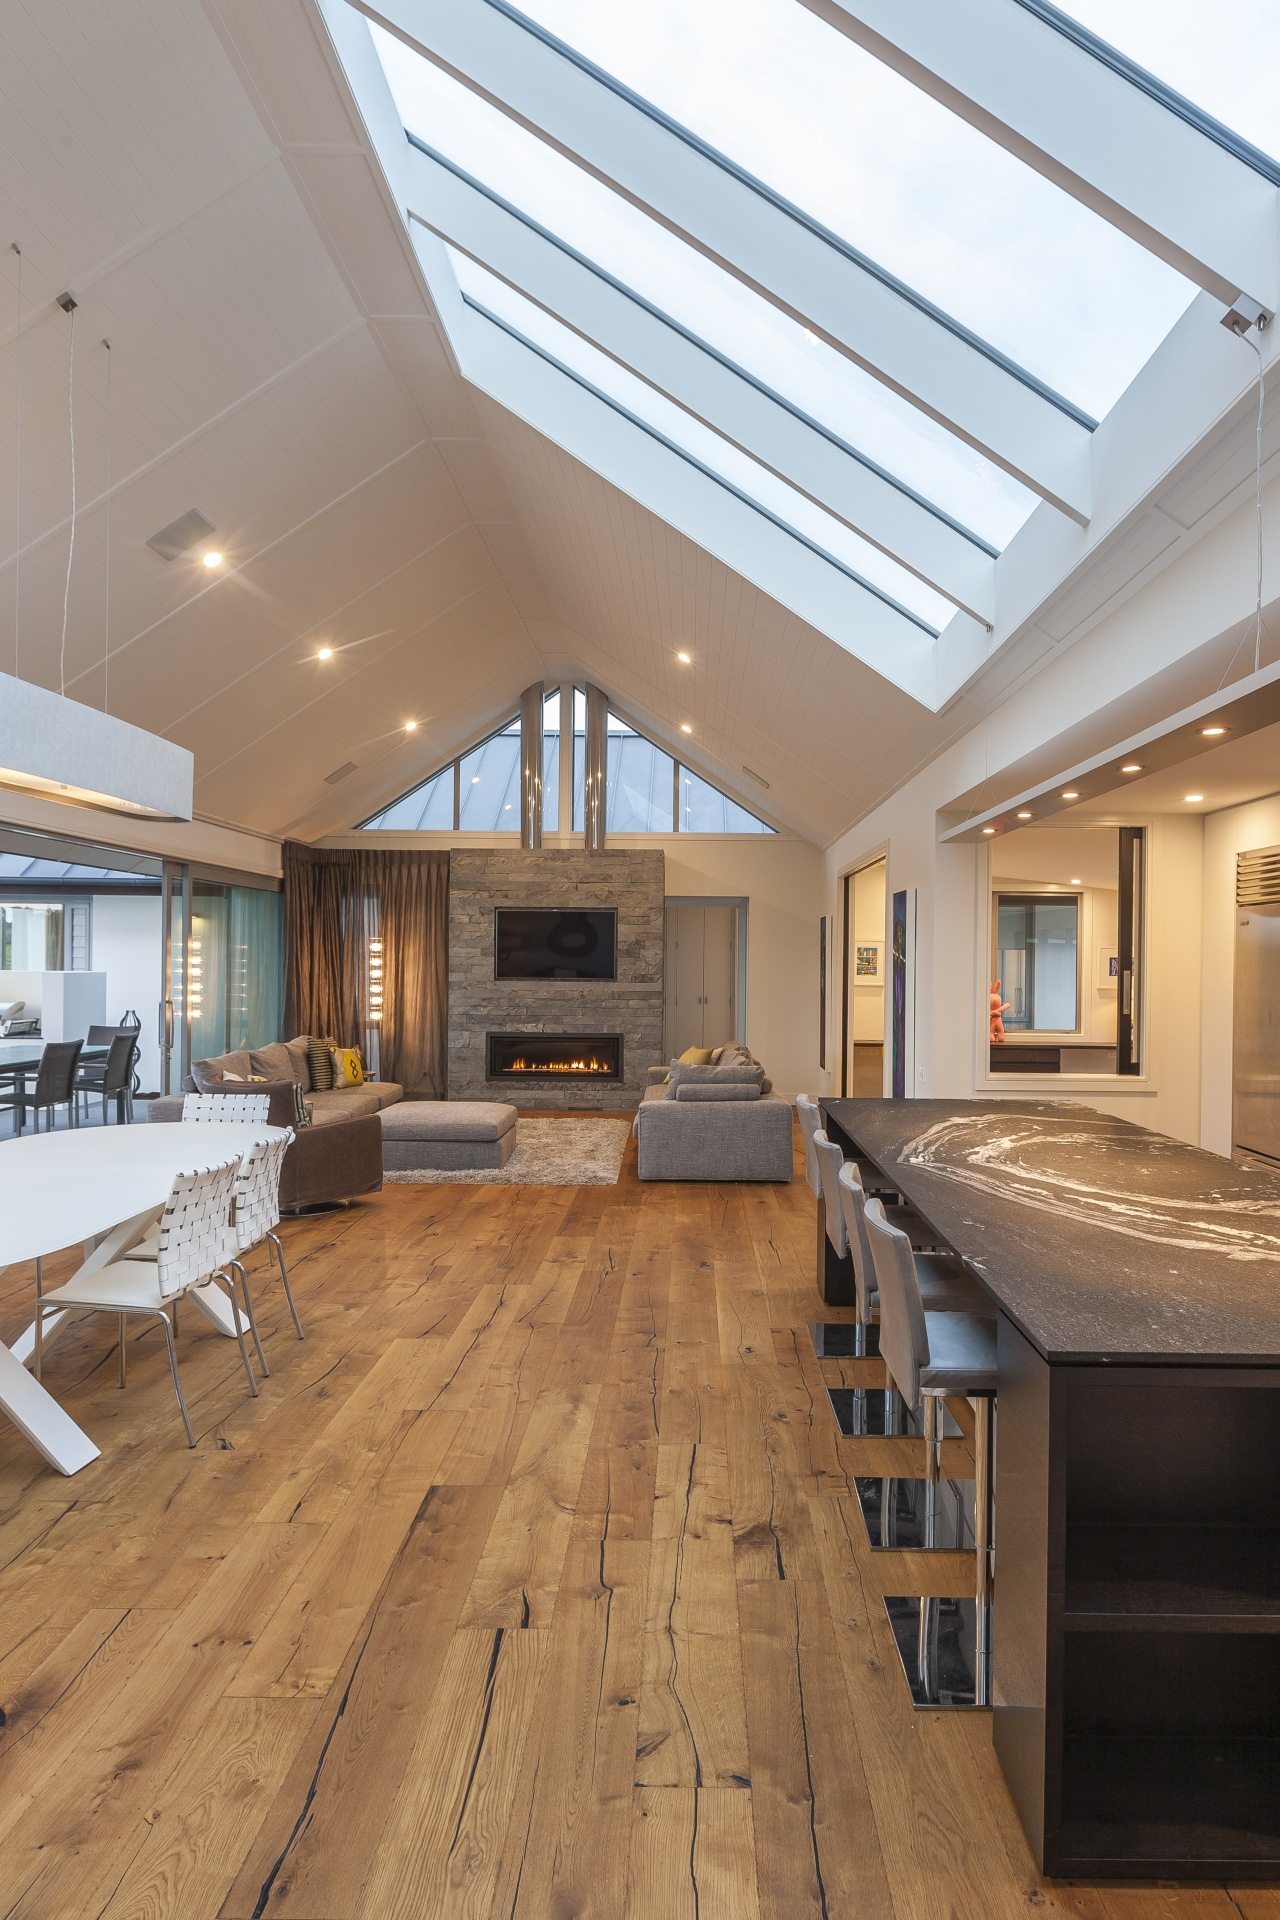 Sarking on the ceiling of this new pavilion-style architecture, ceiling, daylighting, estate, floor, flooring, hardwood, house, interior design, laminate flooring, living room, real estate, roof, window, wood, wood flooring